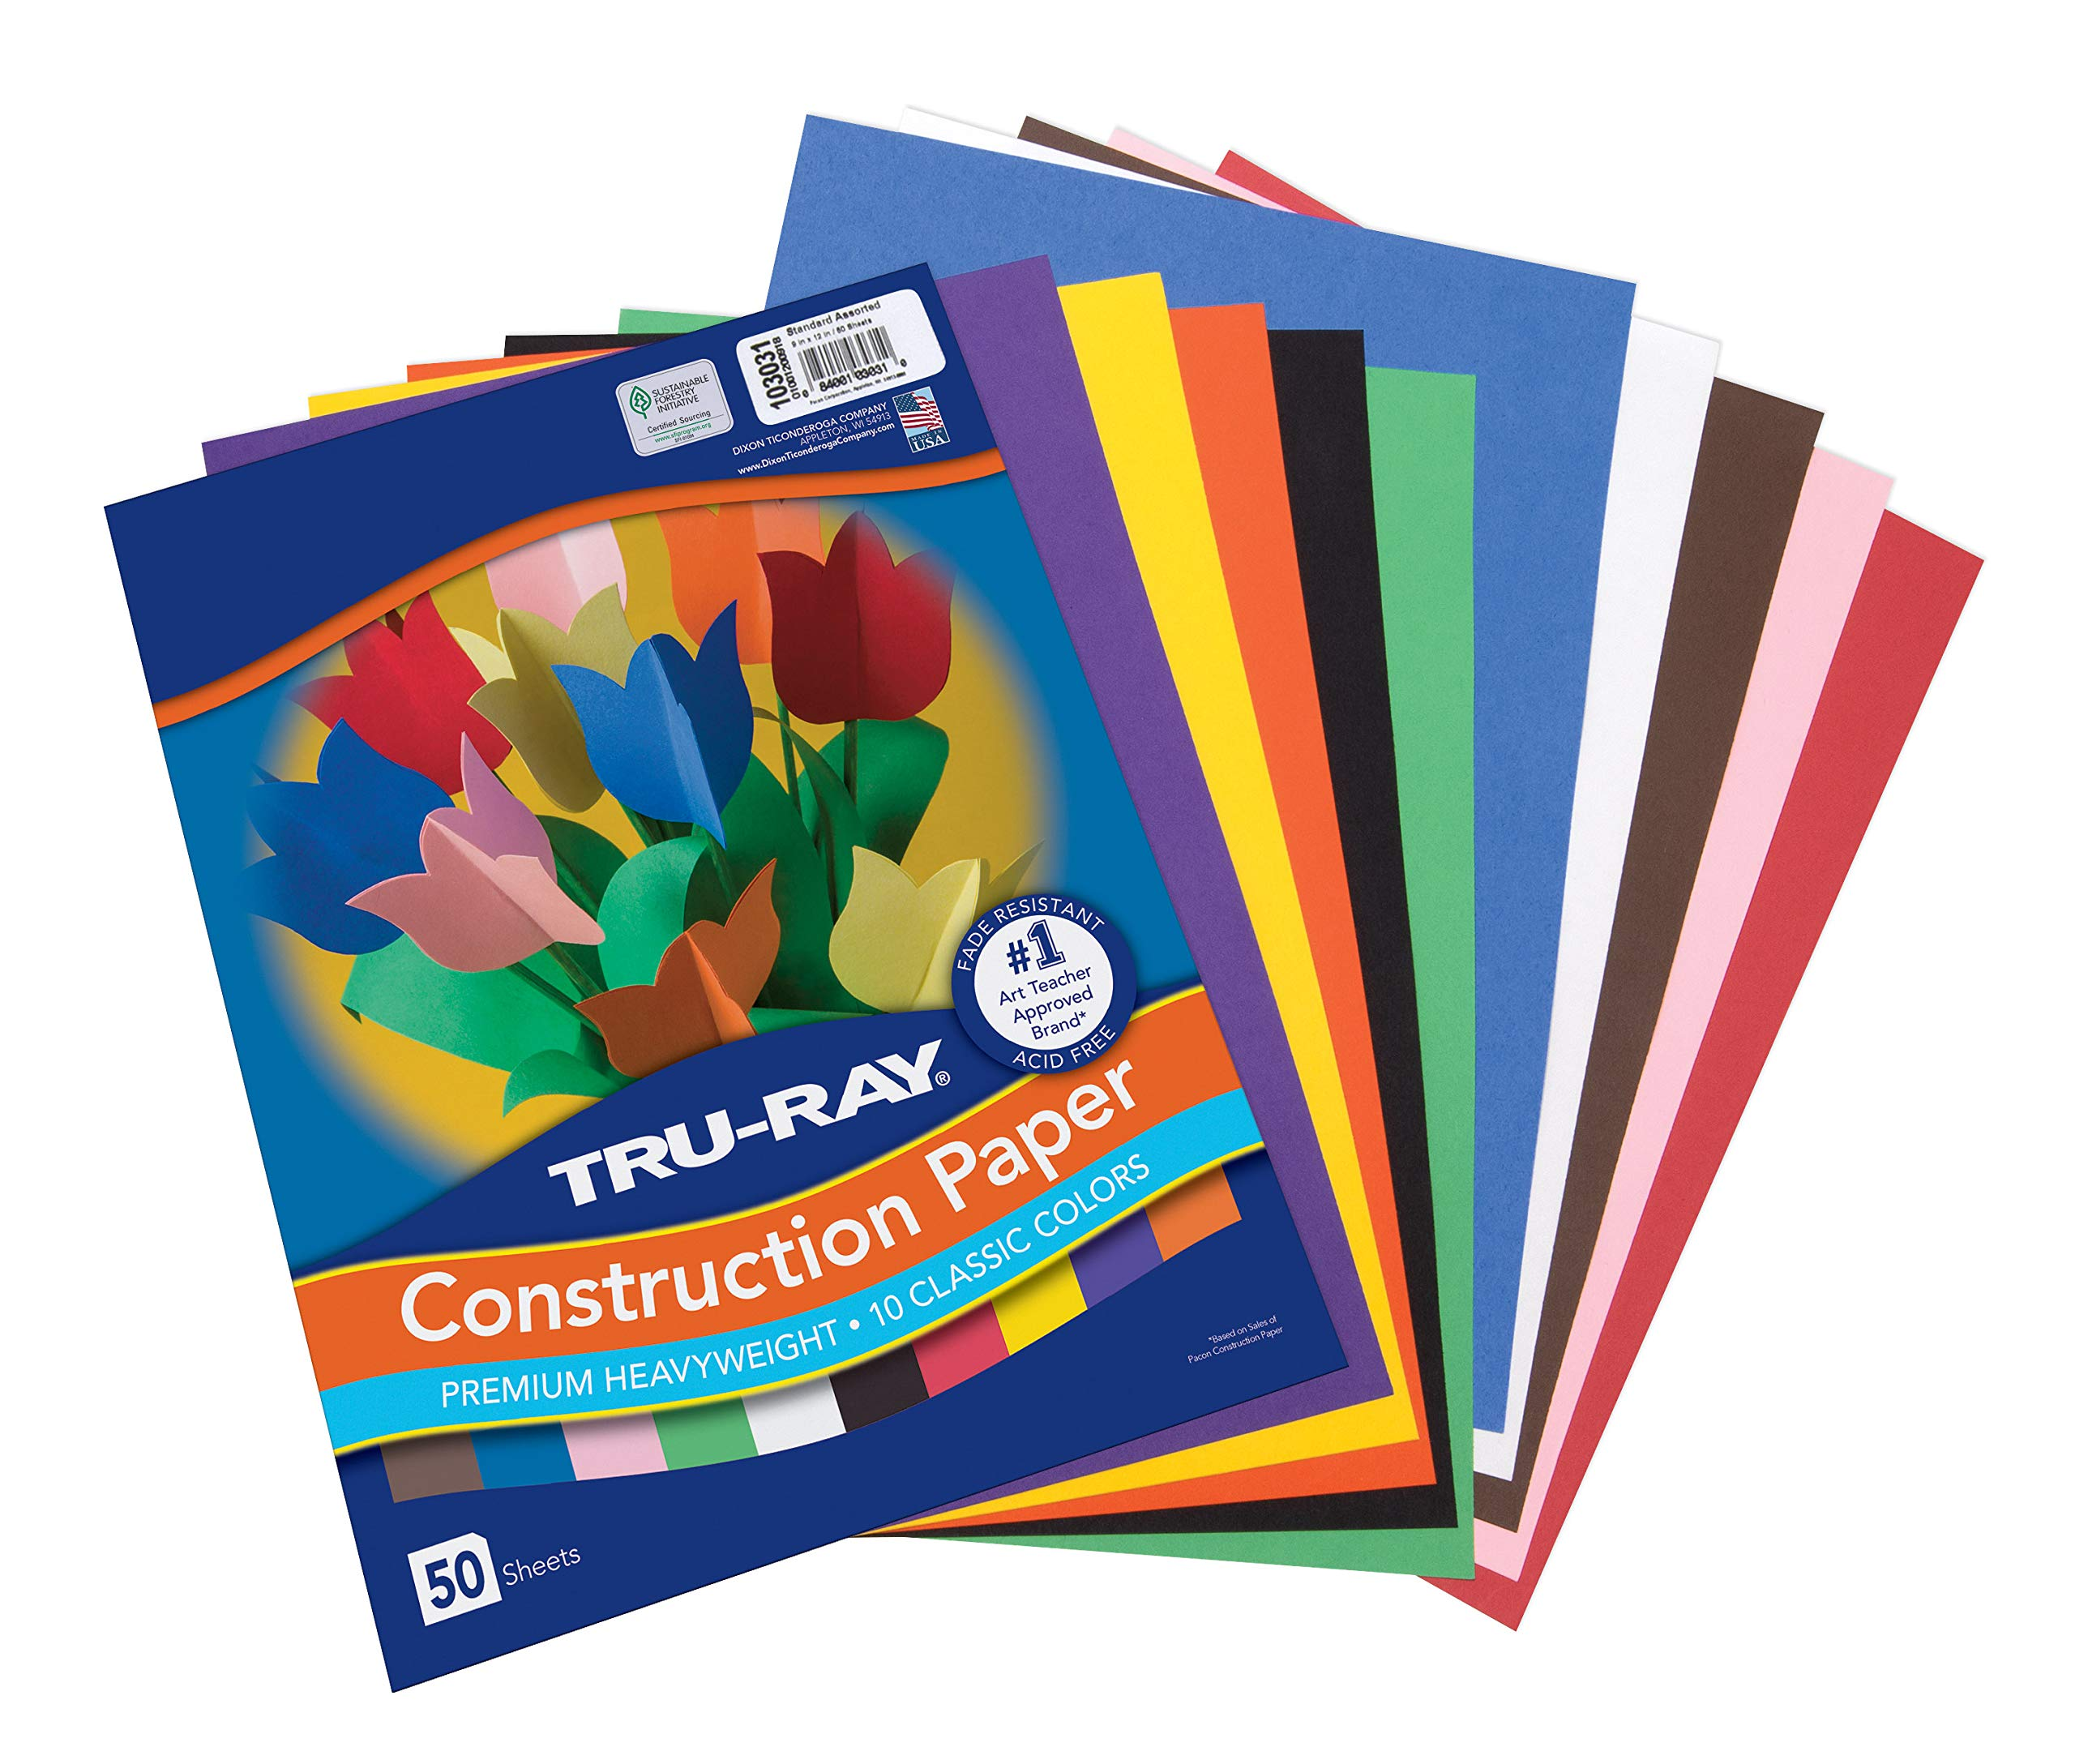 "Tru-Ray Construction Paper 10 Classic Colors 9"" x 12"" 50 Sheets"